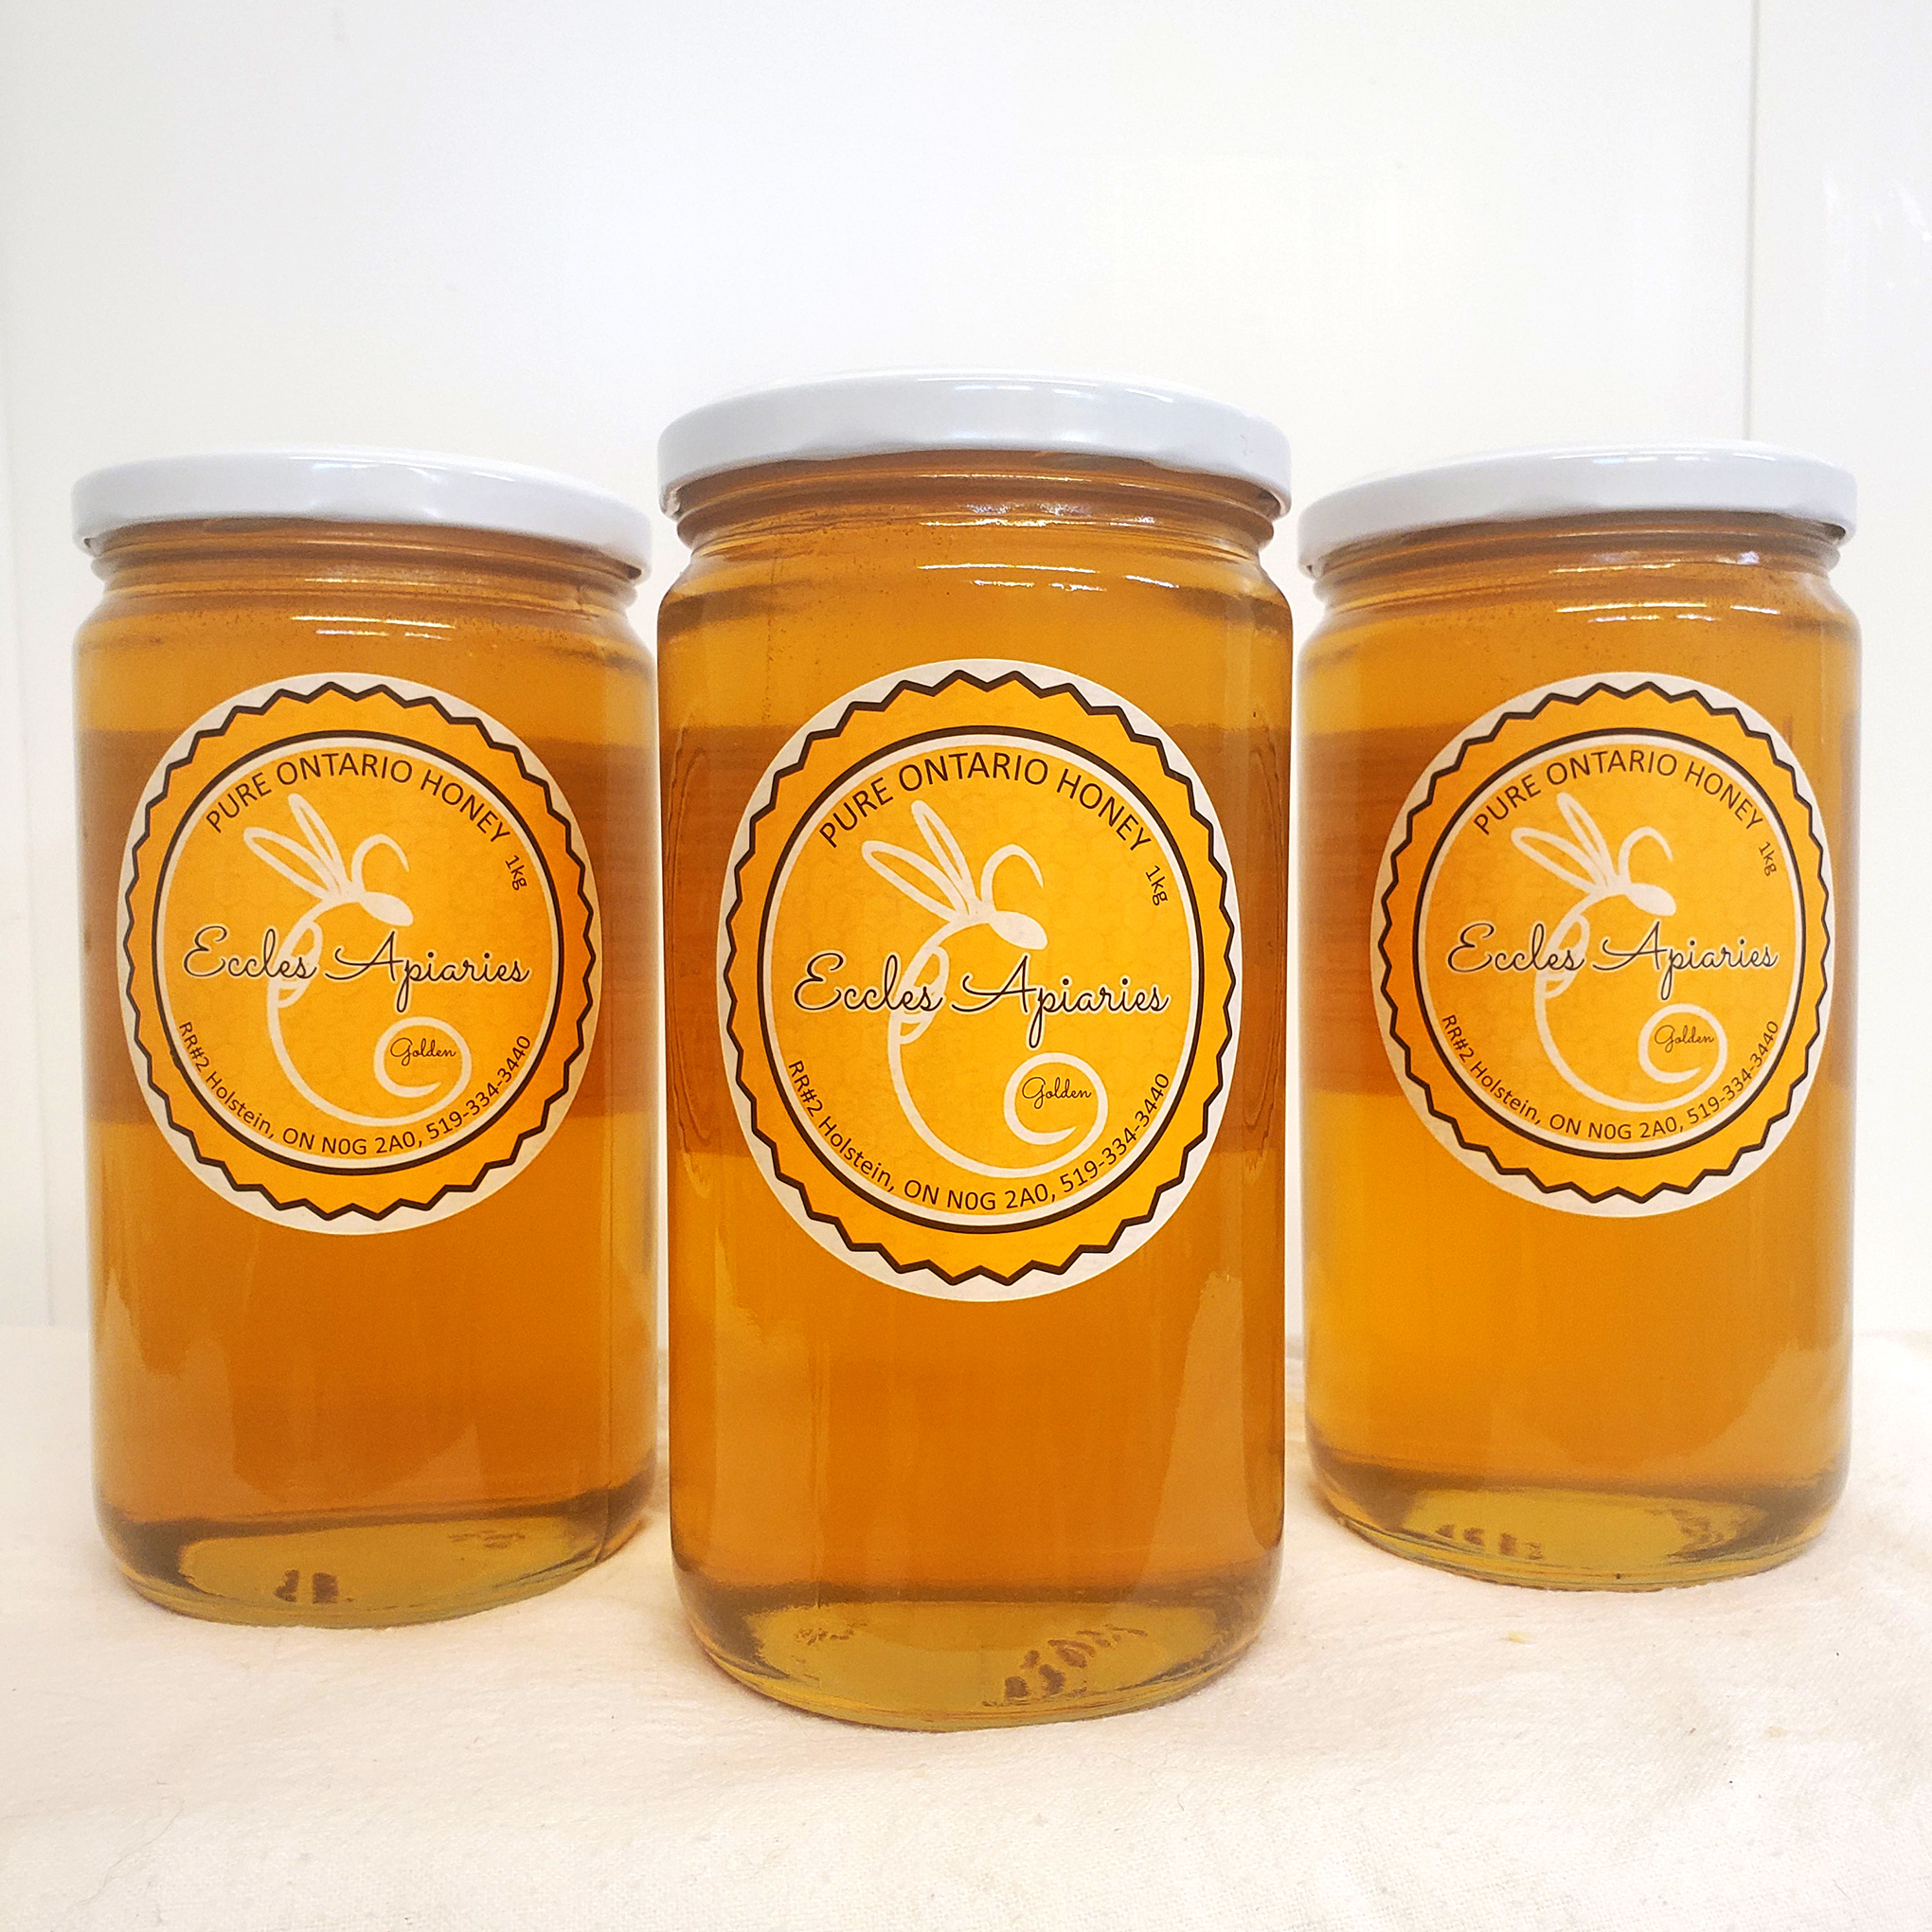 Three_Jars_of_Eccles_Apiaries_Honey